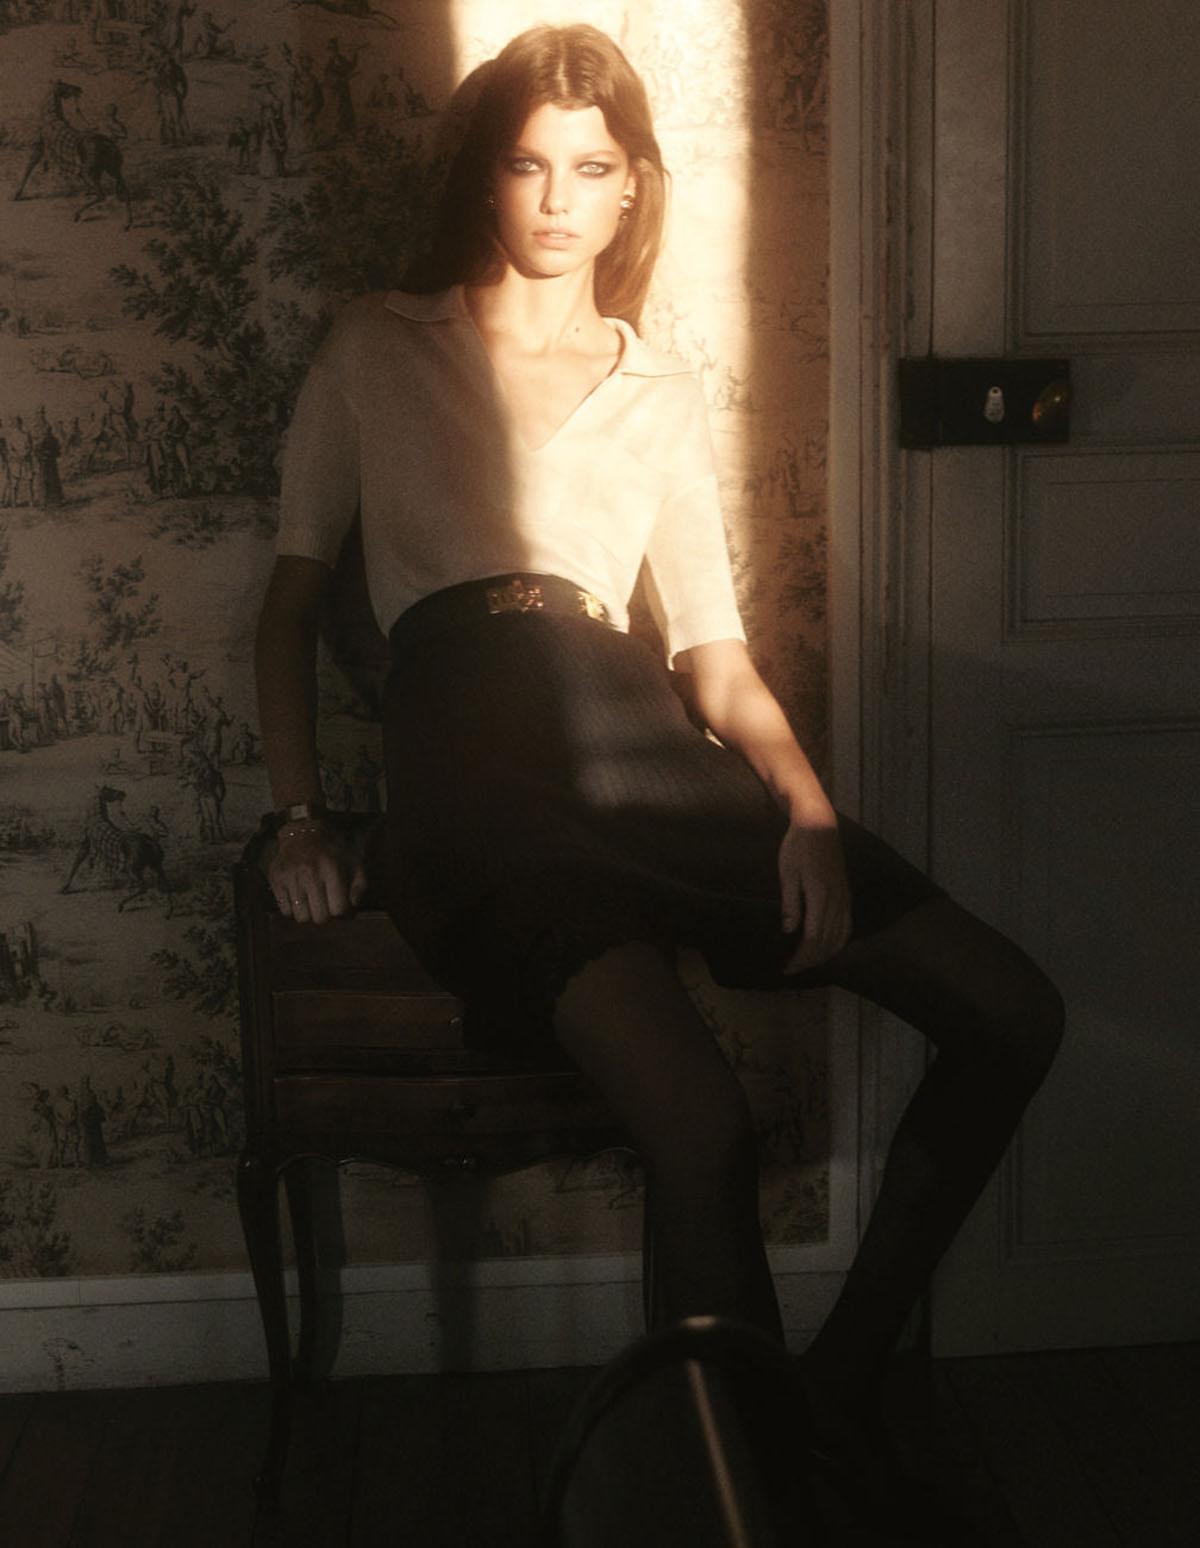 Mathilde Henning by Robin Galiegue for Vogue Paris February 2021